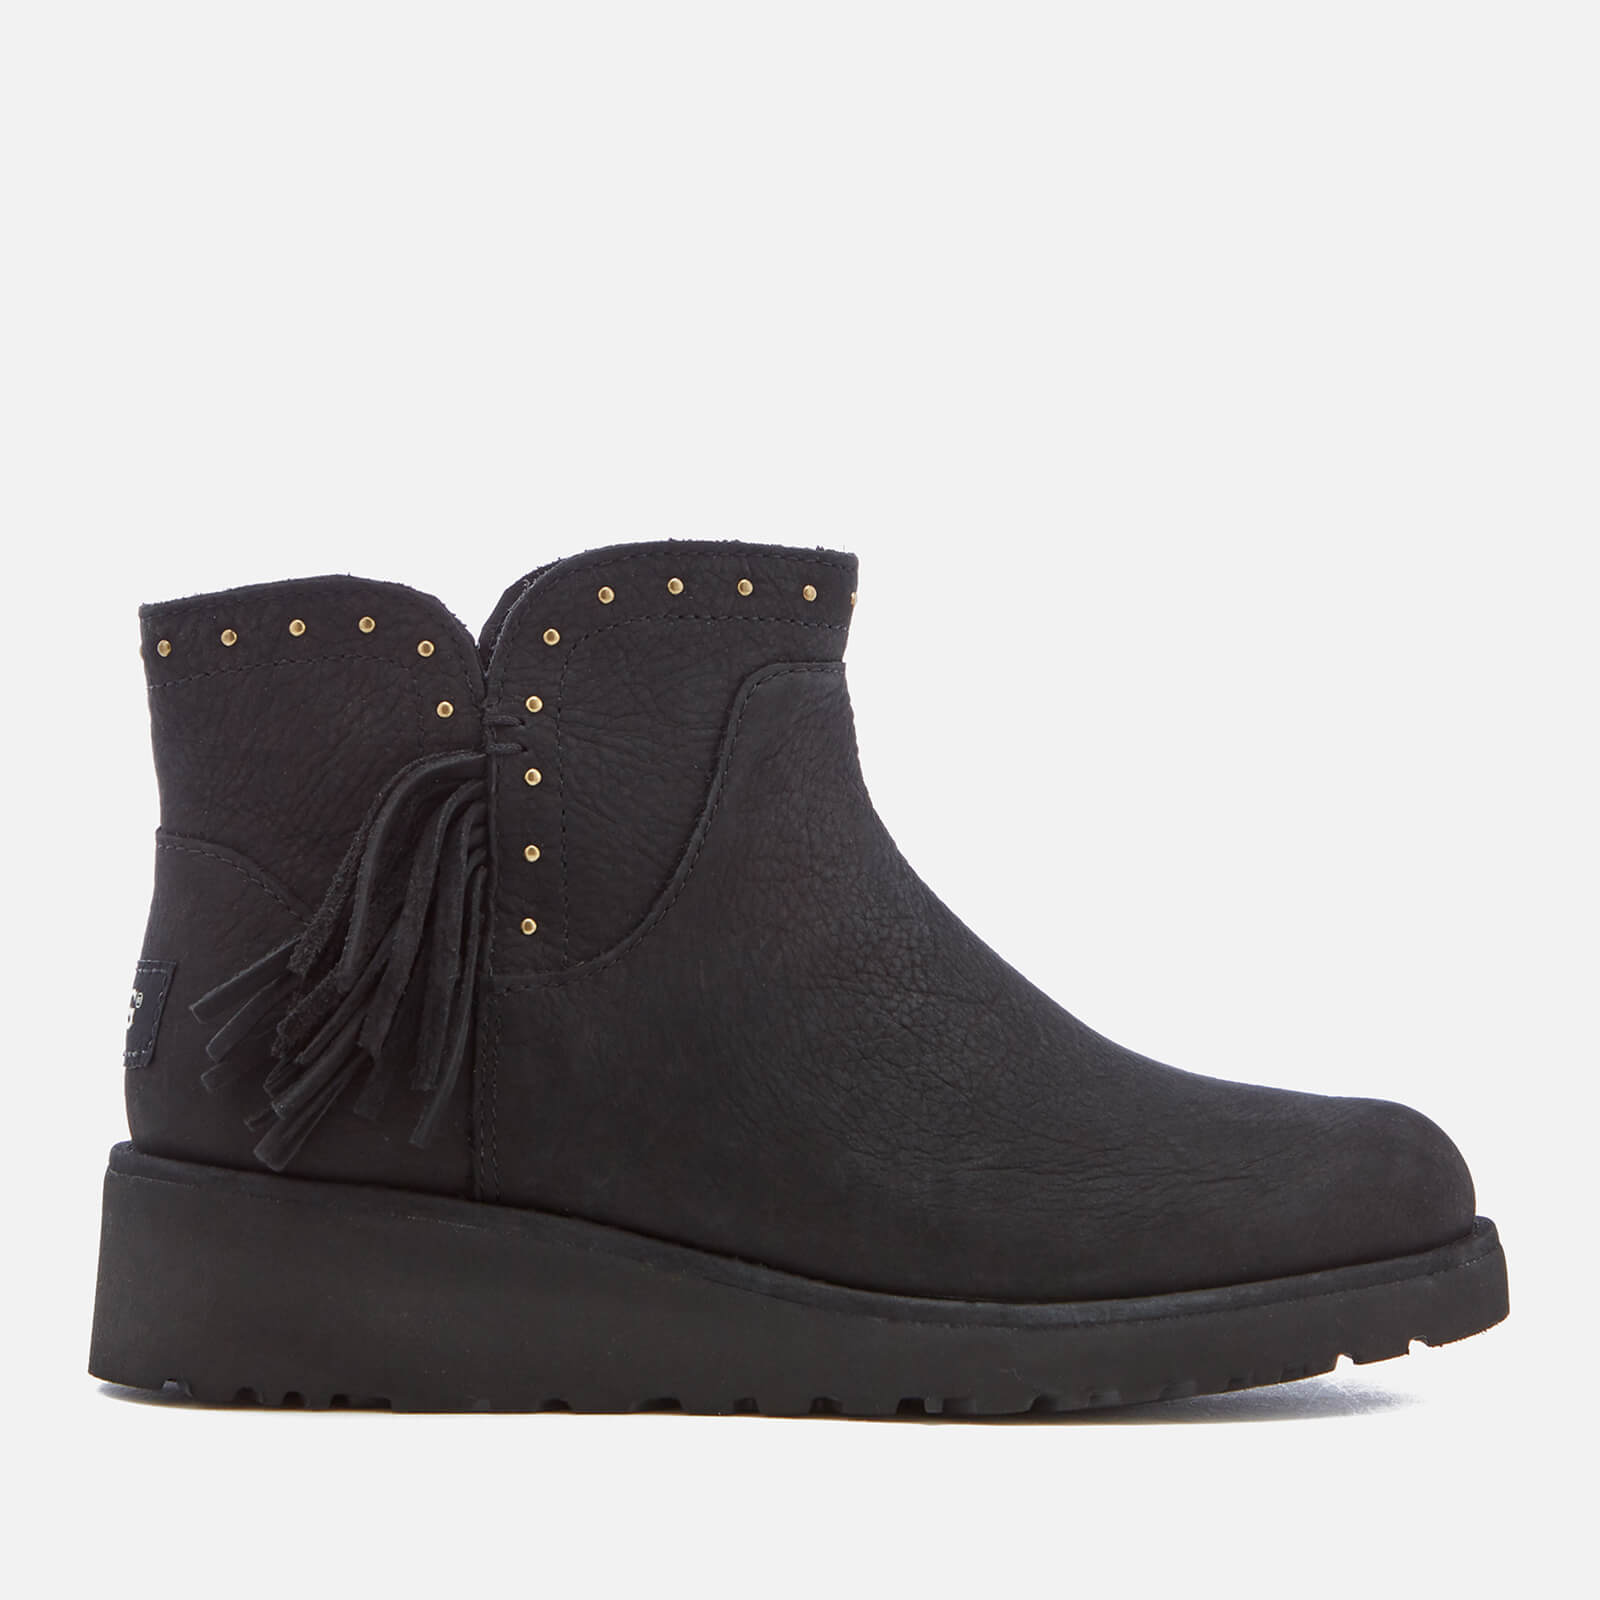 c8540c8e546 UGG Women's Cindy Leather Tassle Ankle Boots - Black